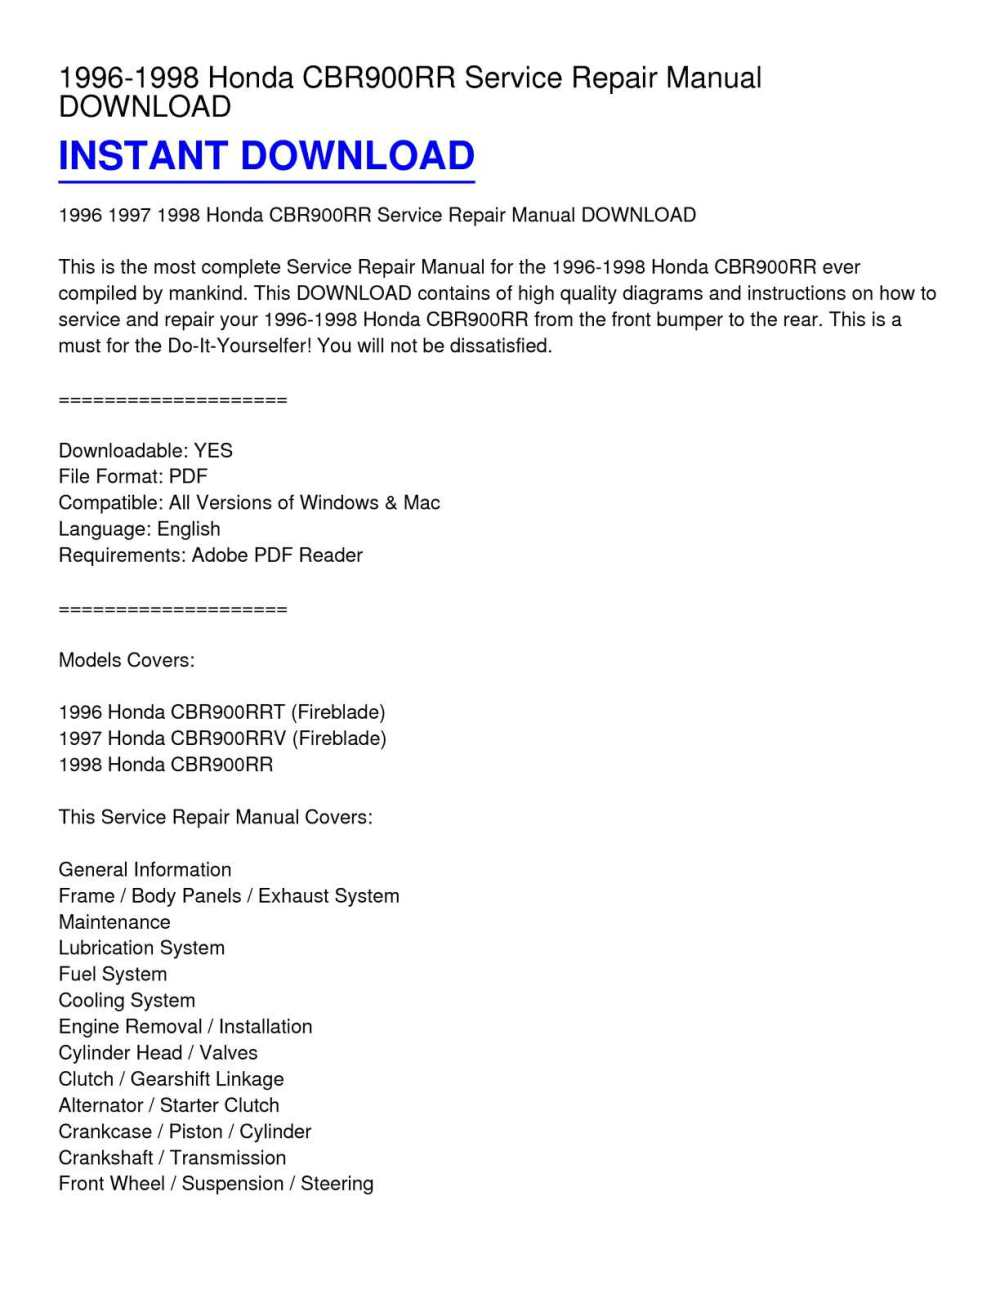 medium resolution of 1996 1998 honda cbr900rr service repair manual download